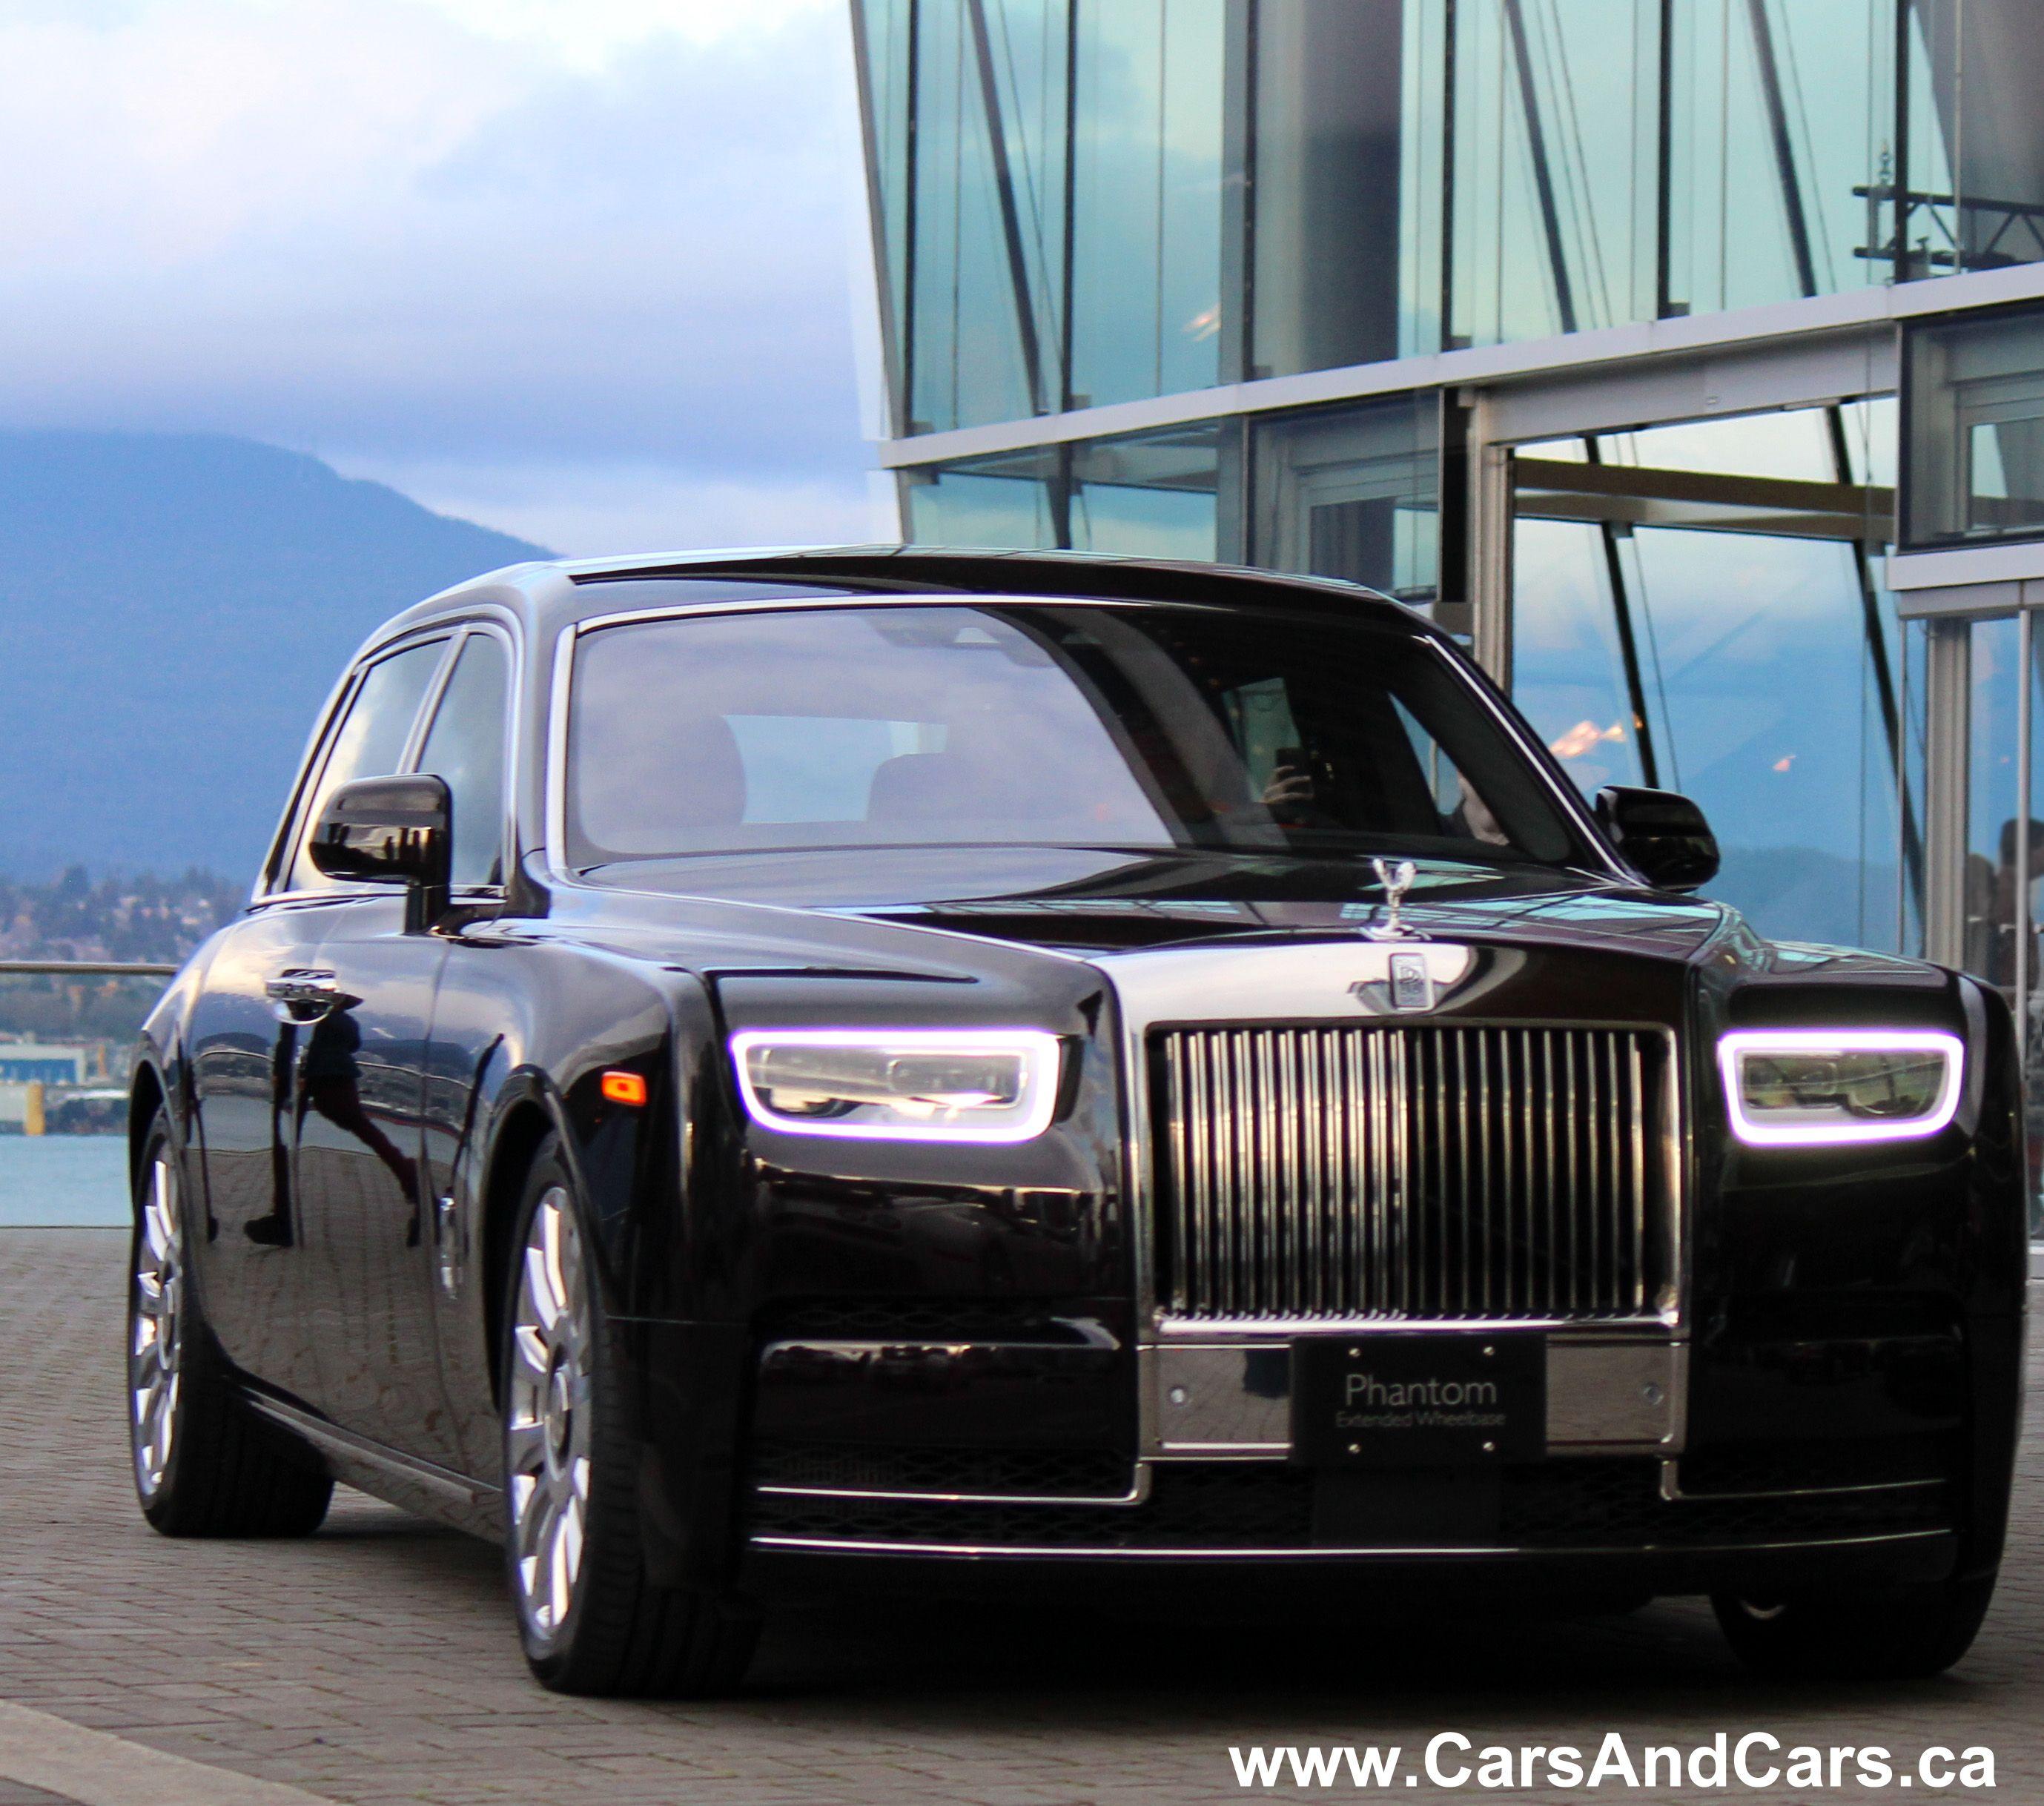 Used Rolls Royce For Sale >> 2018 Rolls Royce Phantom Extended Wheelbase Supercar